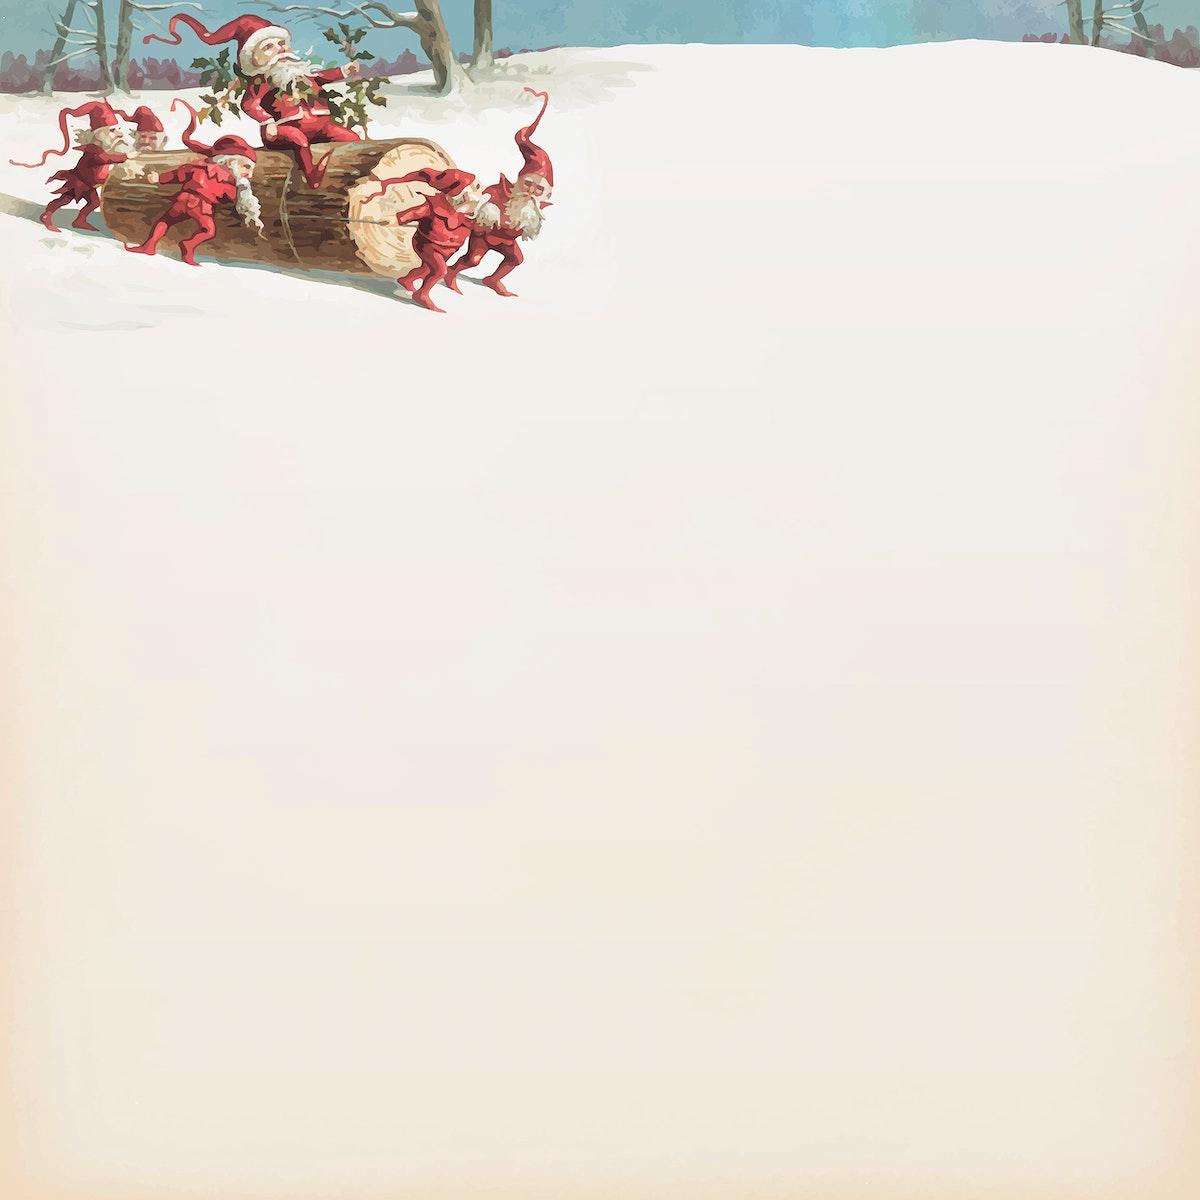 Santa elves sliding on a log from the public domain Christmas vintage illustration vector